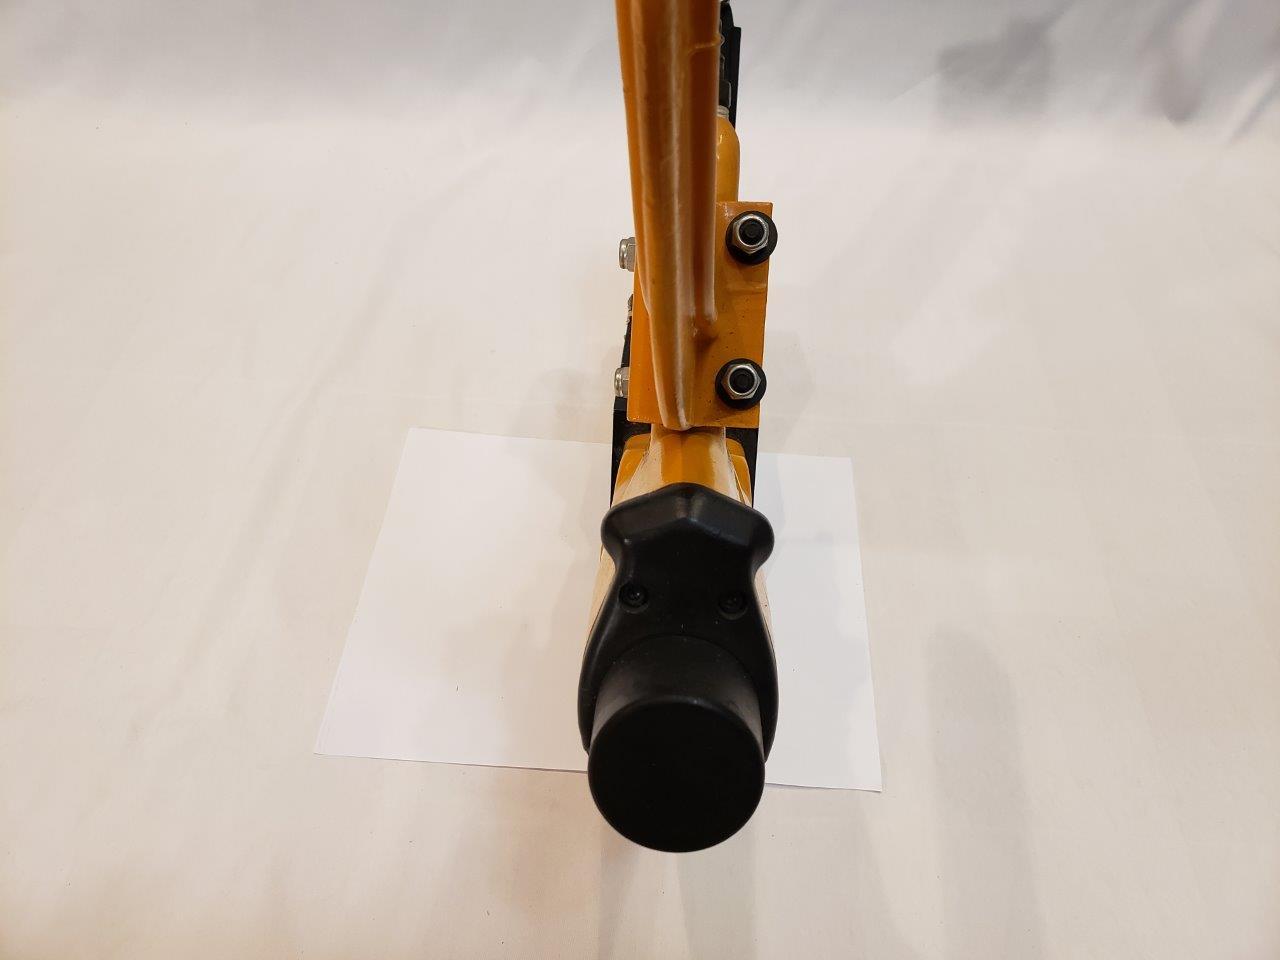 BOSTITCH Flooring Stapler, Pneumatic, 1-1/2-Inch to 2-Inch (MIIIFS) Nail Gun Pneumatic fastener